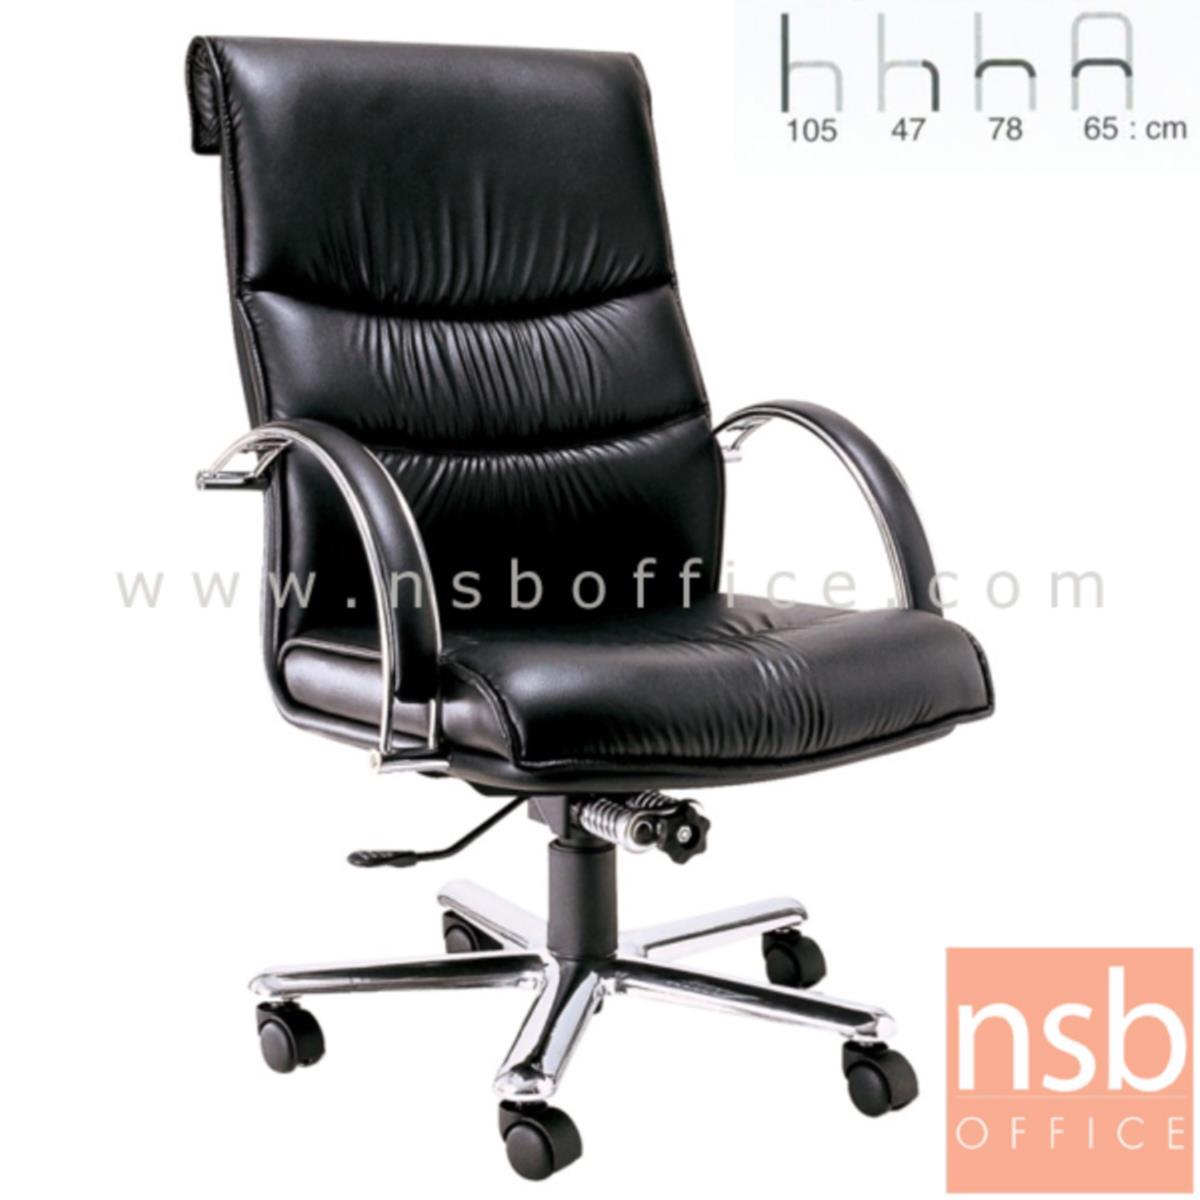 B28A018:เก้าอี้หัวหน้างาน รุ่น Spyker (สปายเกอร์)  โช๊คแก๊ส มีก้อนโยก ขาเหล็กชุบโครเมี่ยม